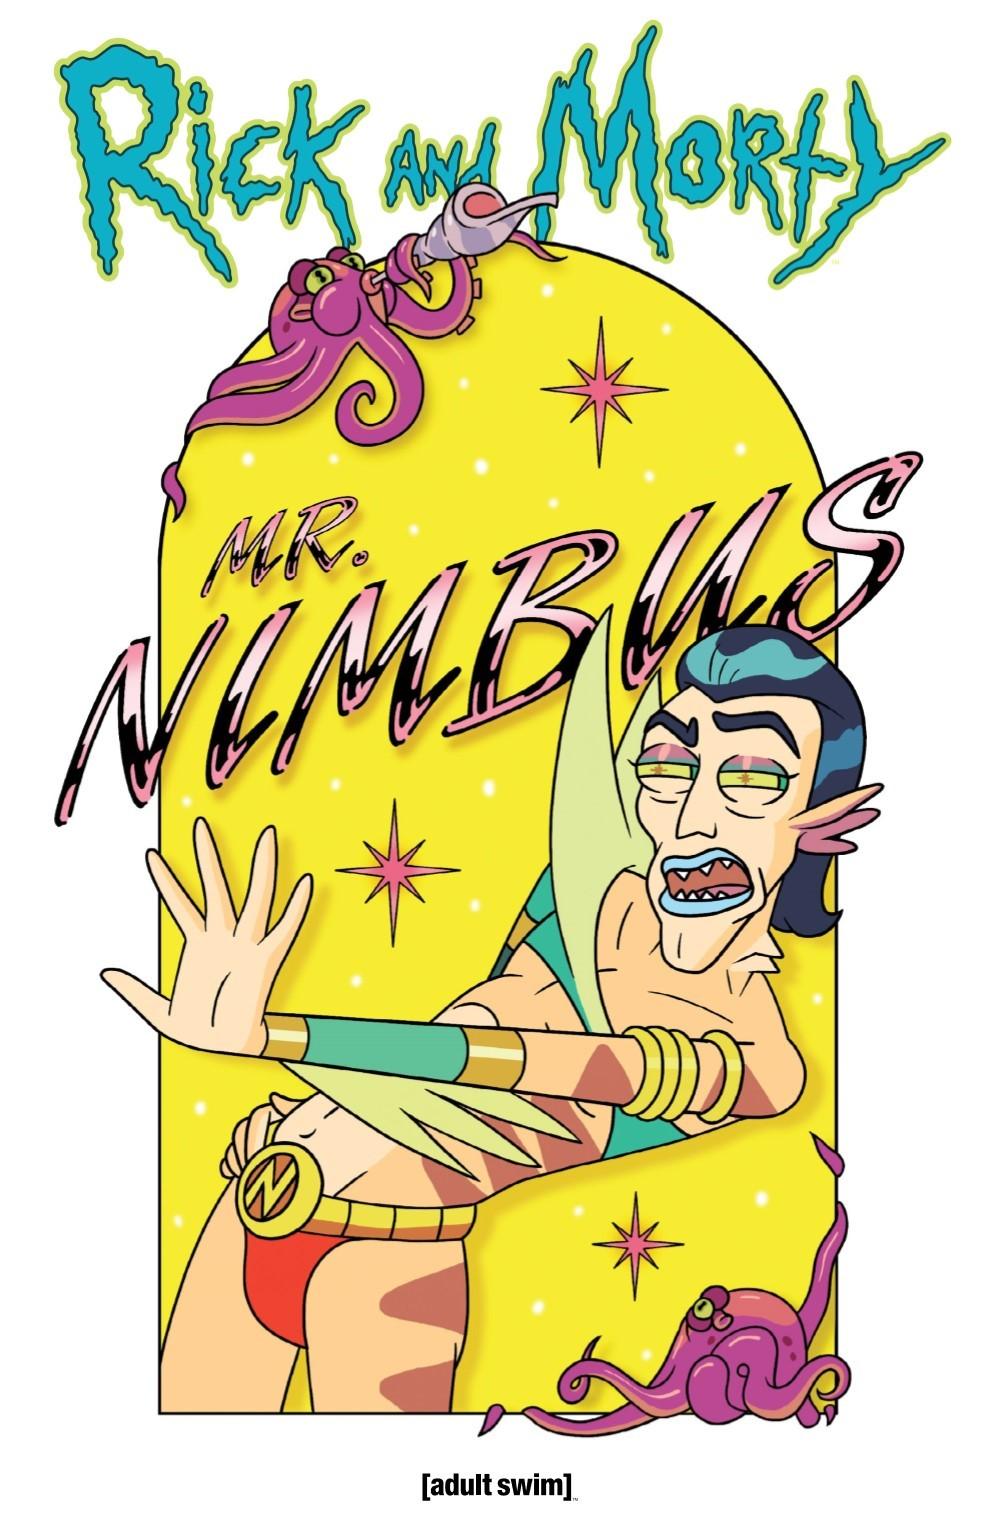 RM-MRNIMBUS-1-REFERENCE-03 ComicList Previews: RICK AND MORTY MR. NIMBUS #1